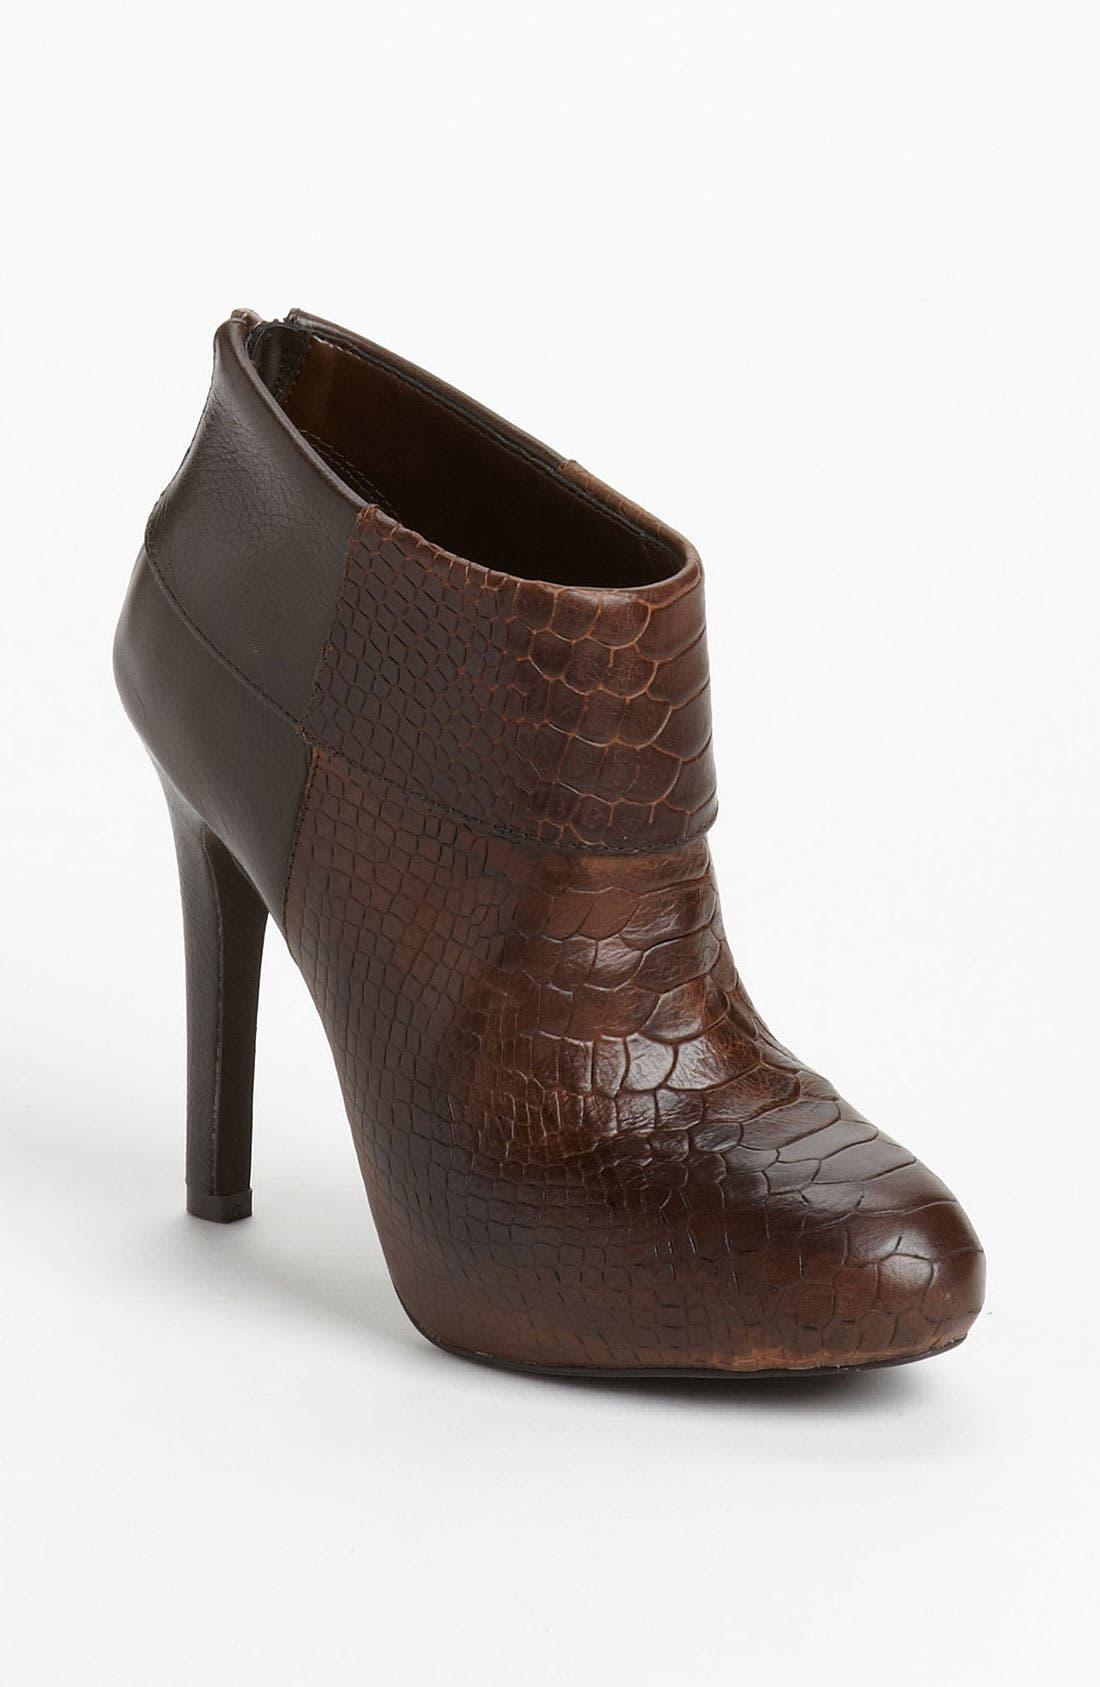 Main Image - Jessica Simpson 'Audriana' Boot